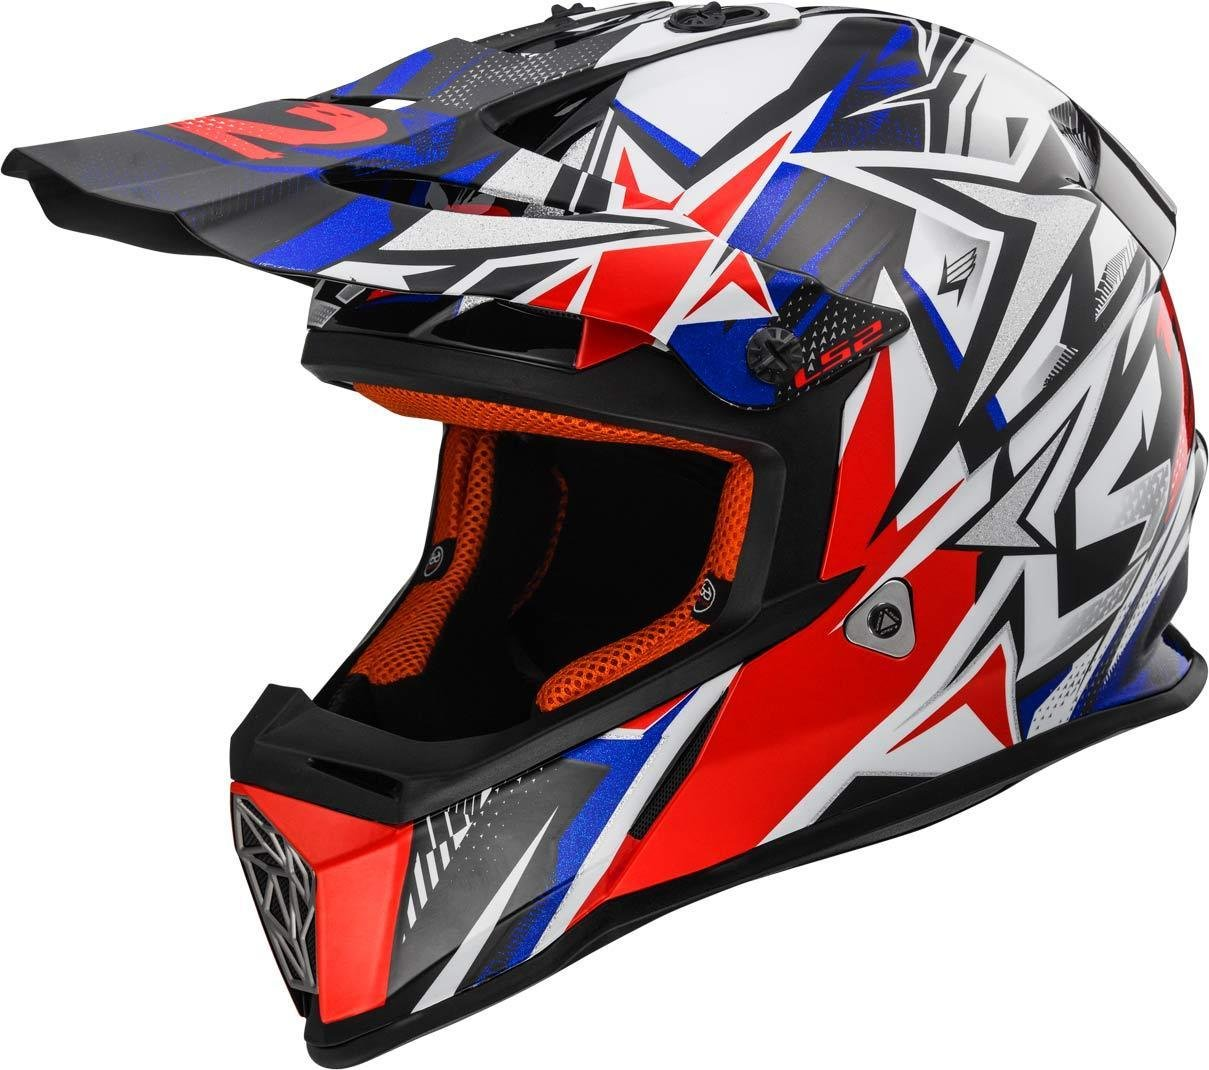 S 5cm L 9-10Yrs Leopard LEO-X17 Red Kids Motocross Motorbike Helmet S 49-50cm /& Gloves /& Goggles Kids CAMO Motocross 1PC Suit